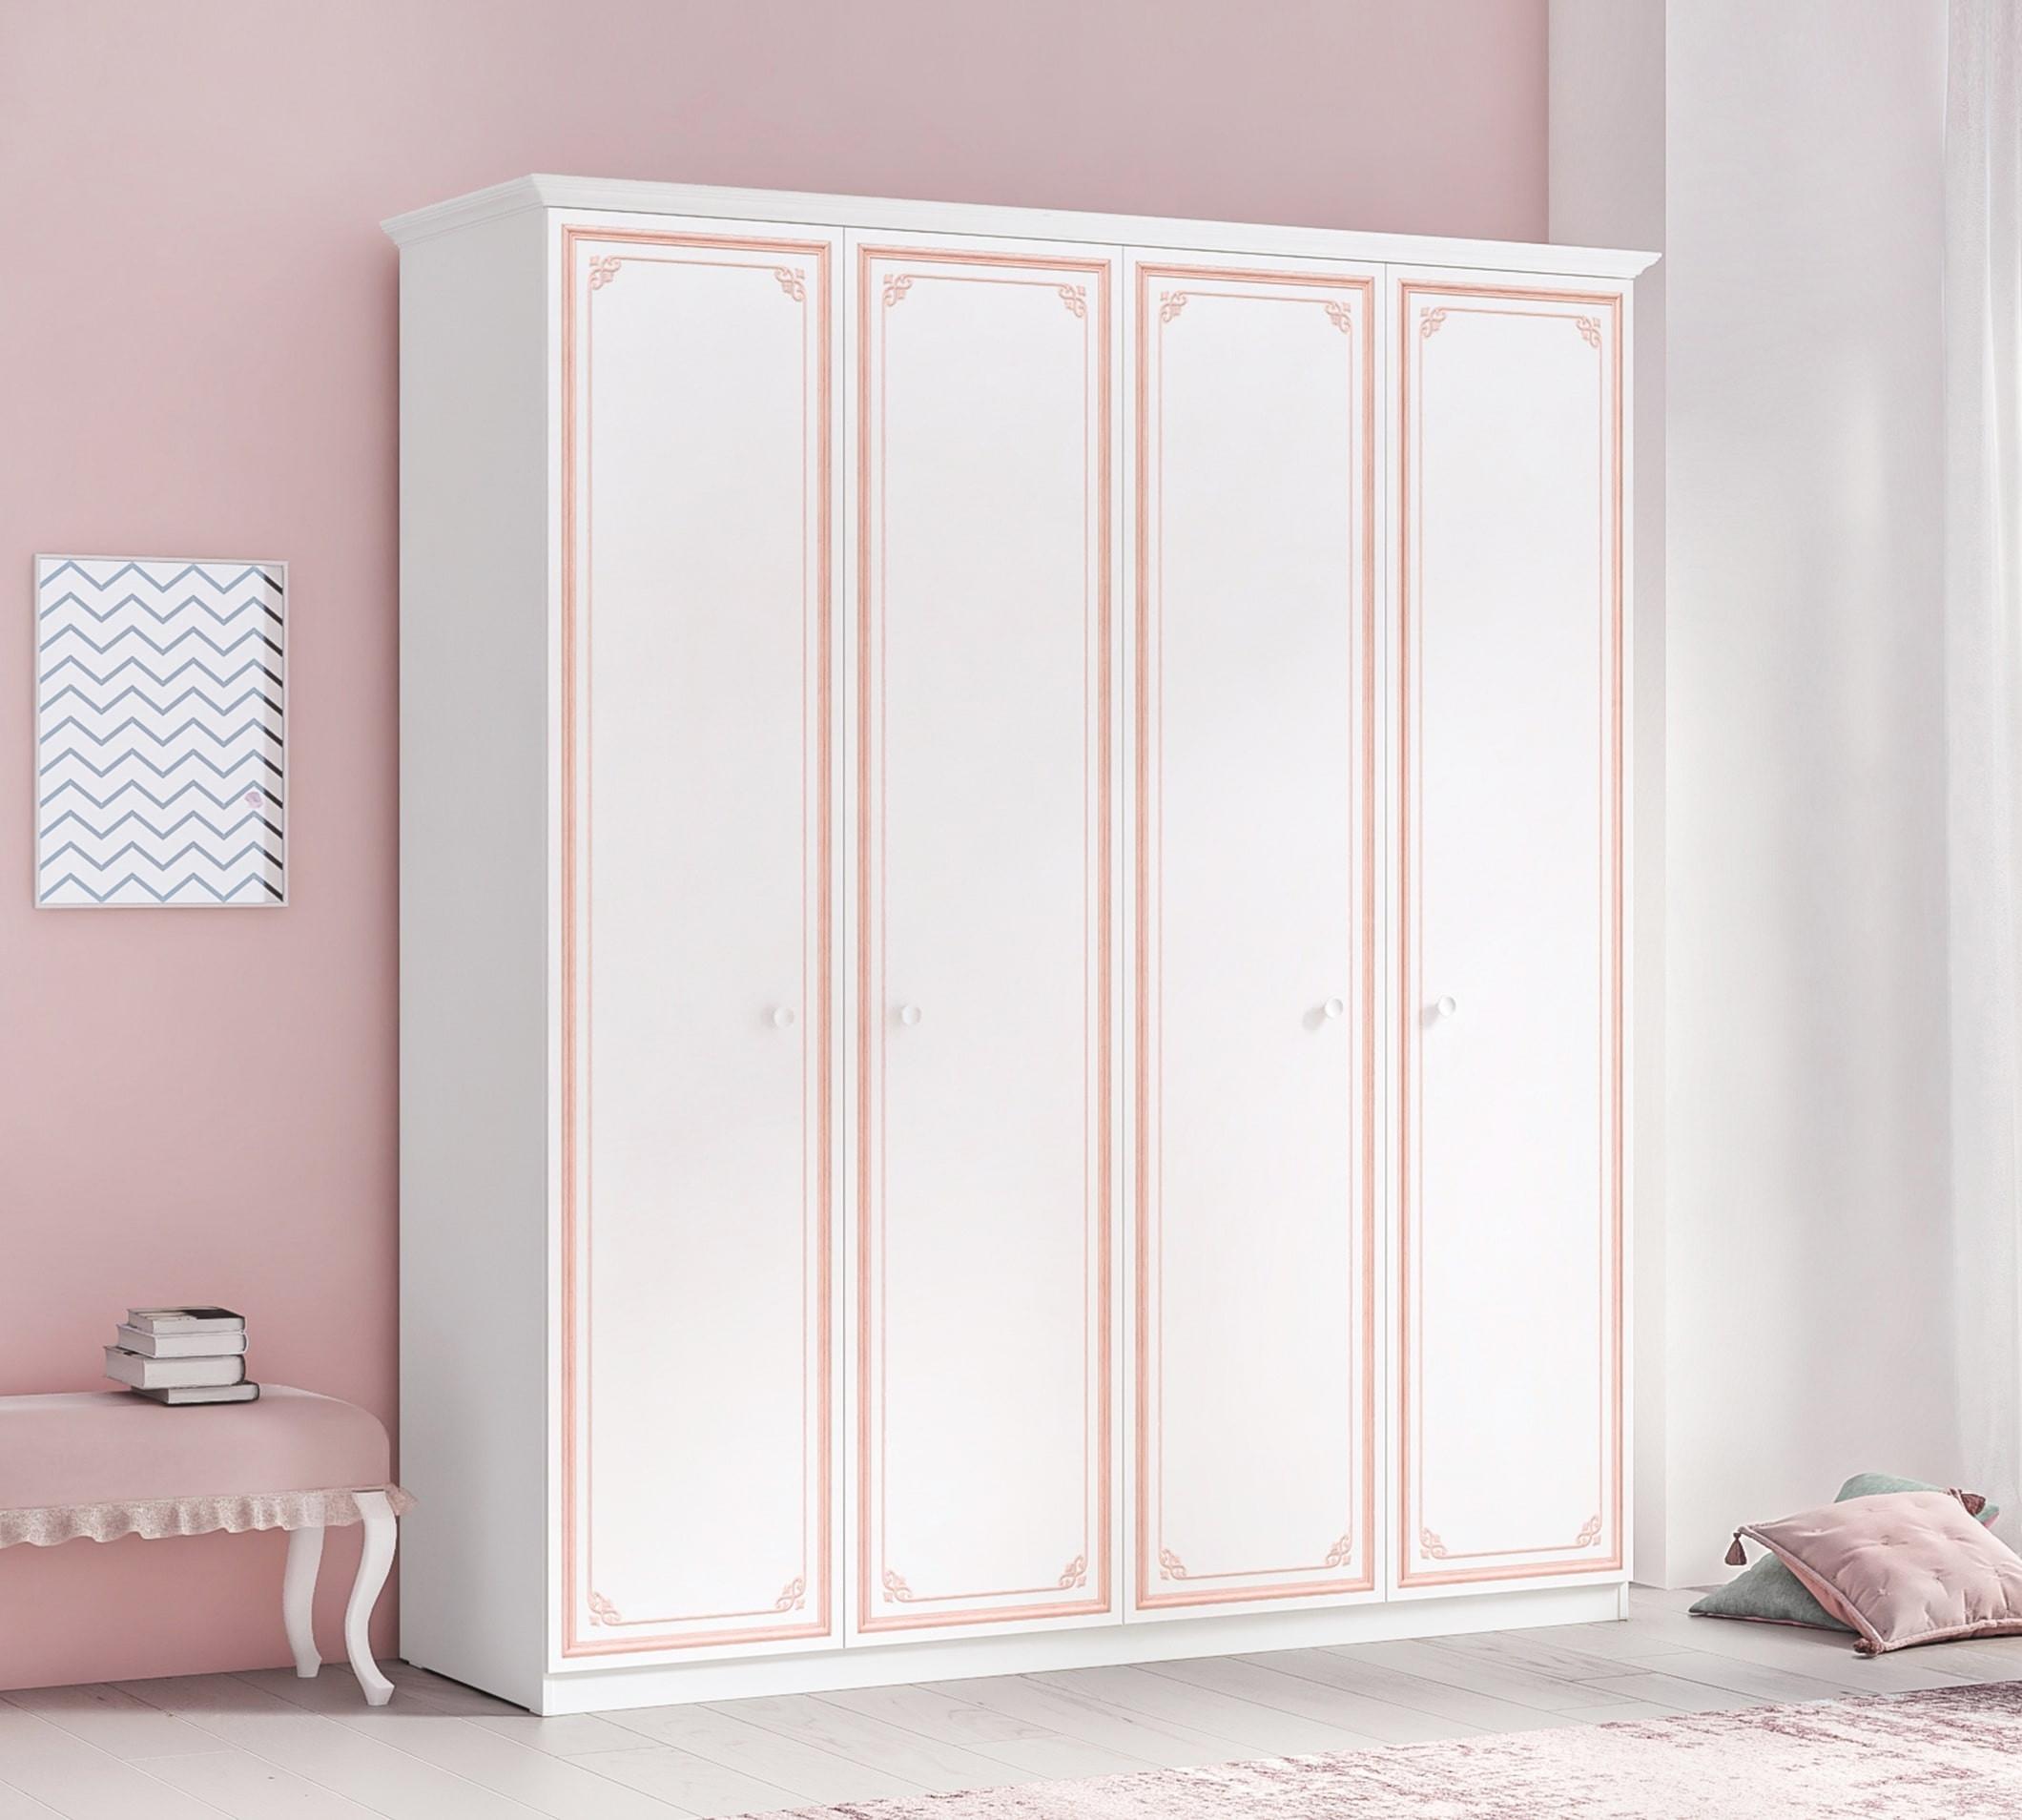 Dulap din pal cu 4 usi, pentru tineret Selena Pink Alb / Roz, l186xA61xH212 cm